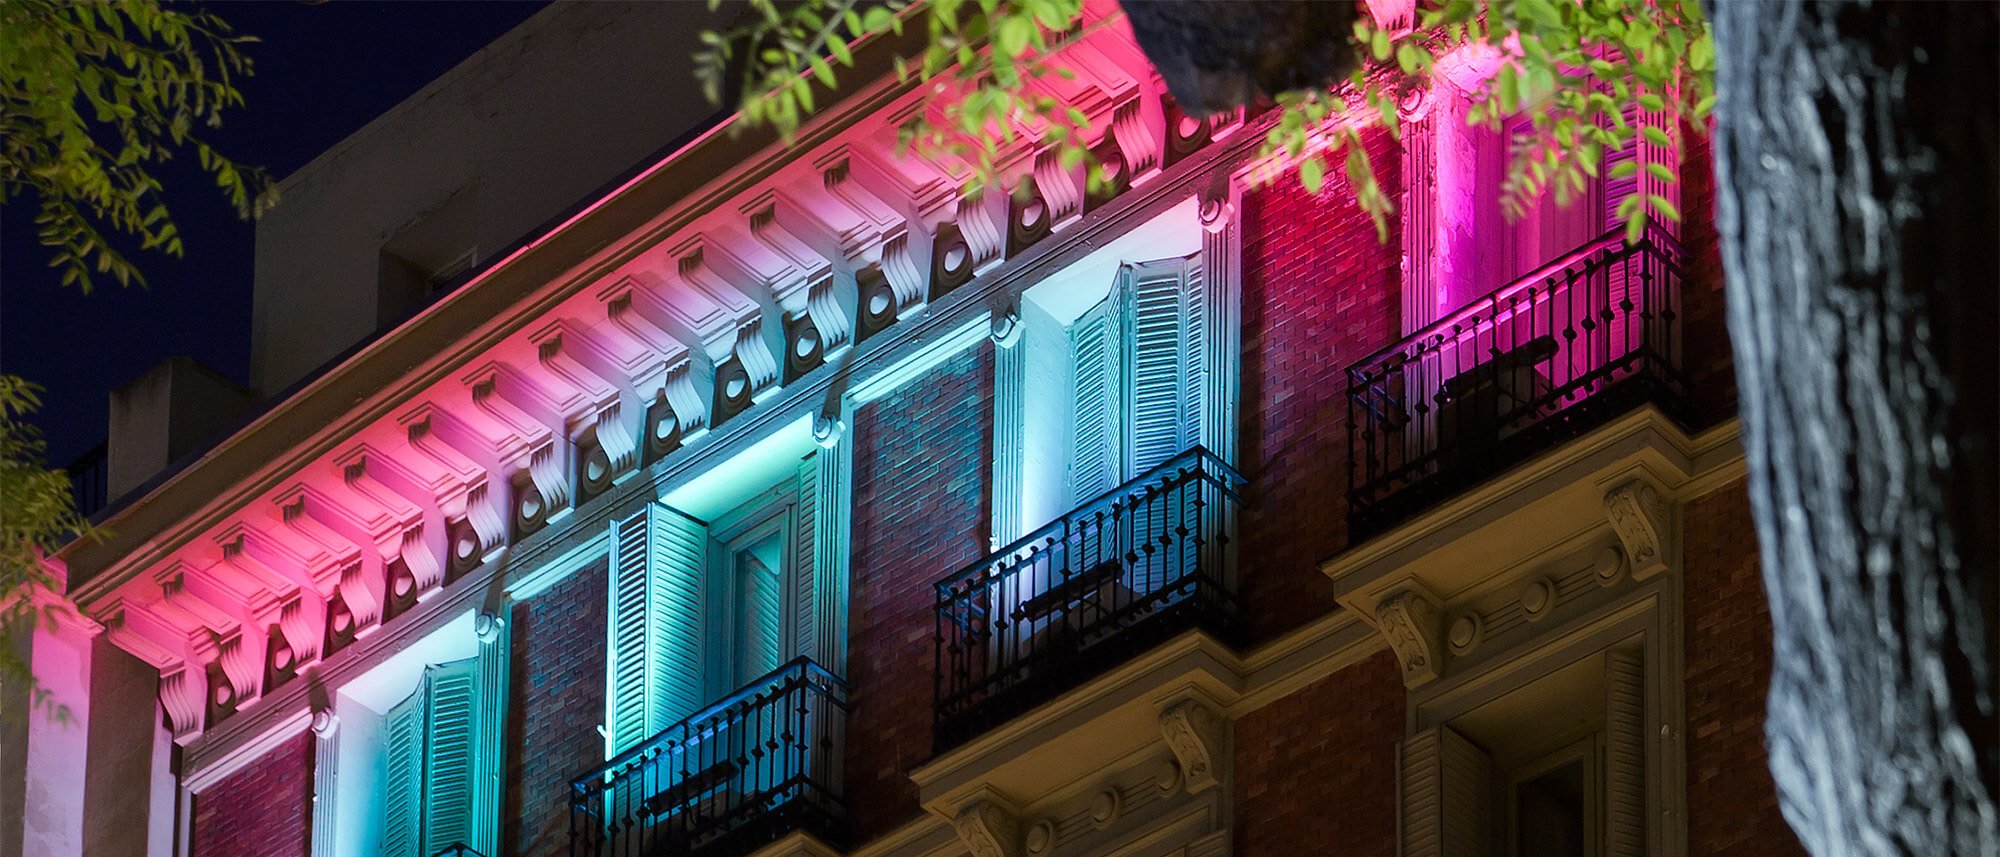 Madrid 2011 45 edici n casadecor - Casa decor 2017 madrid ...